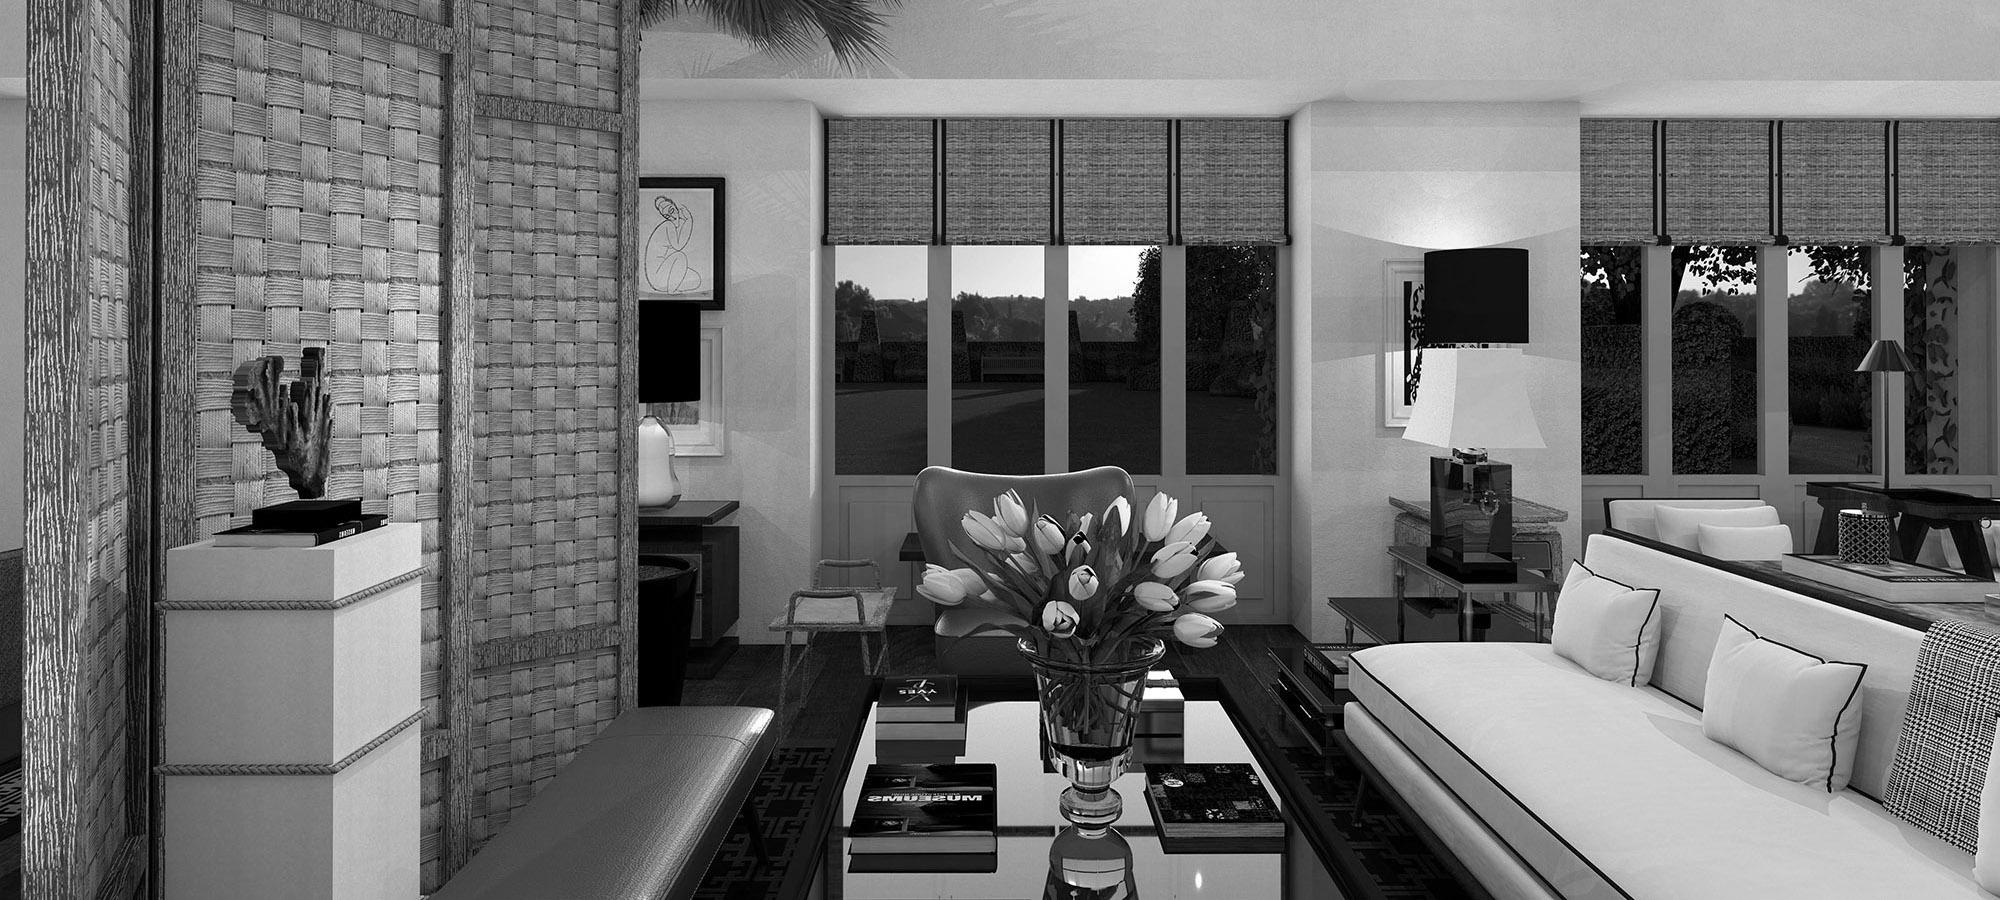 michele-bonan-interiors-showroom-6-bw-1